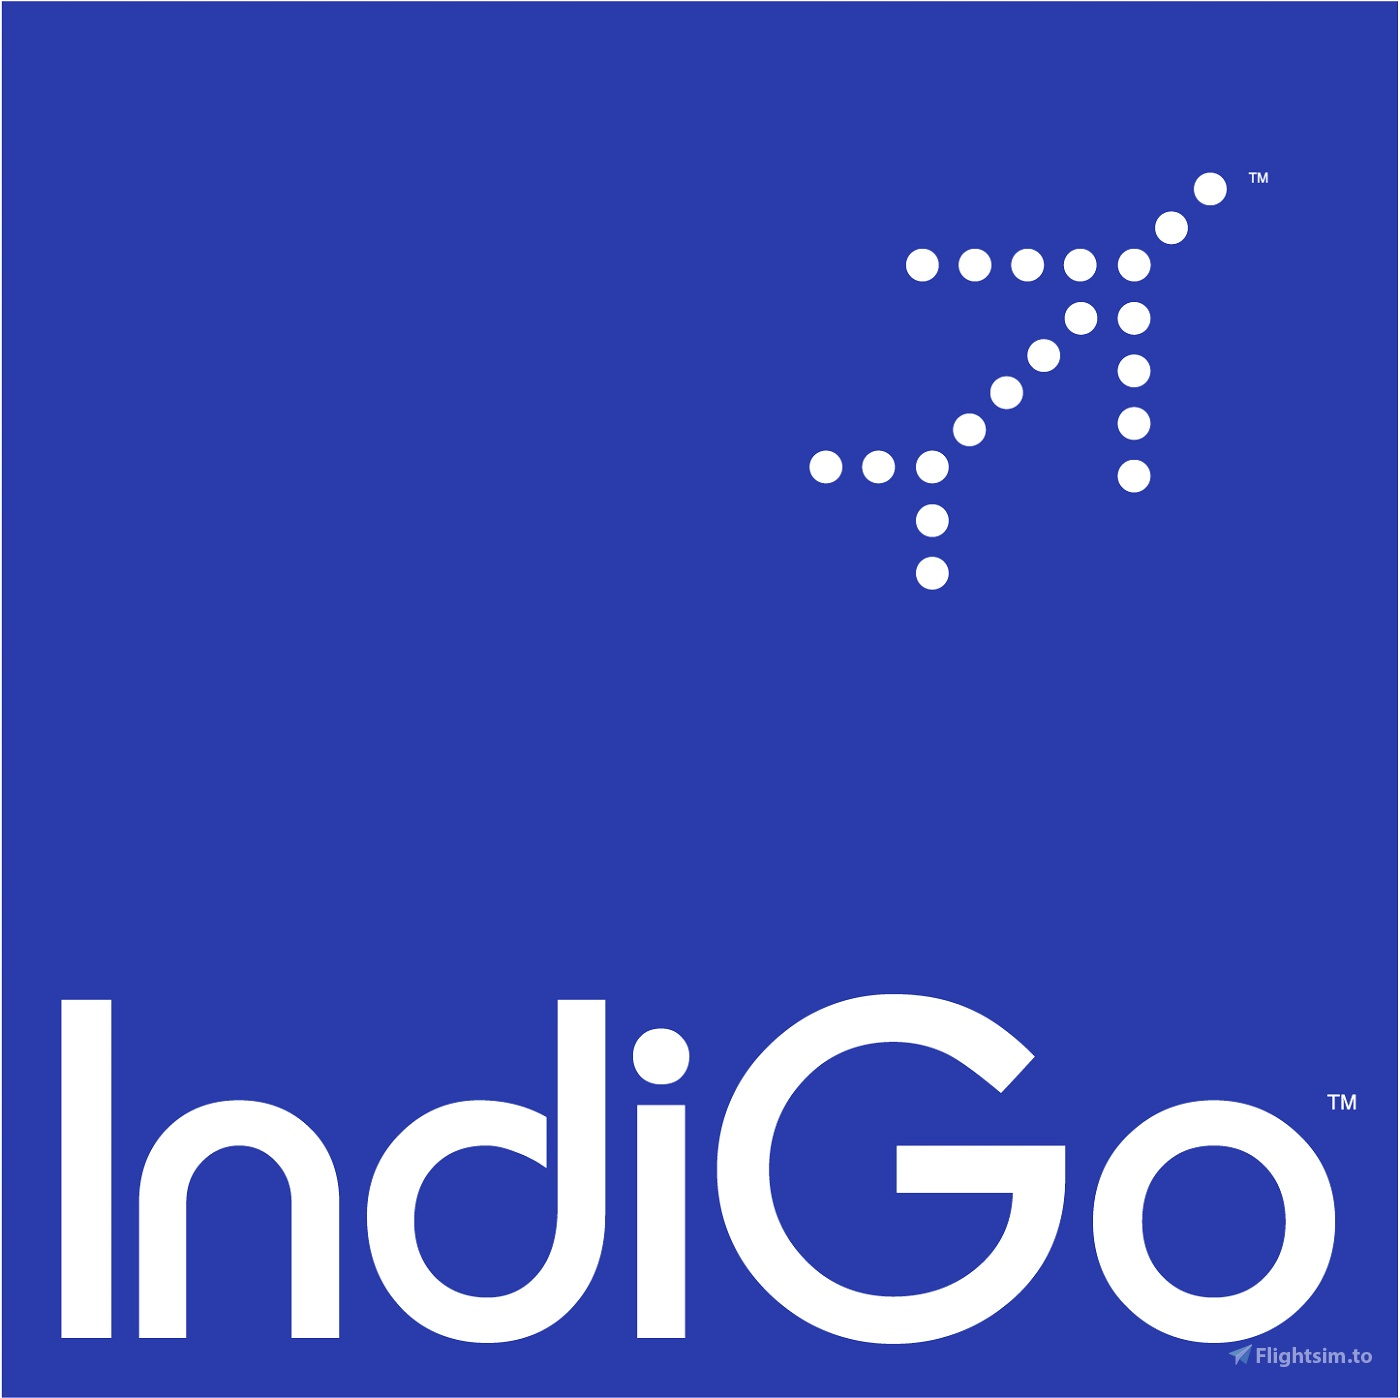 Self Loading Cargo - Indigo Airline Cabin Announcements Microsoft Flight Simulator